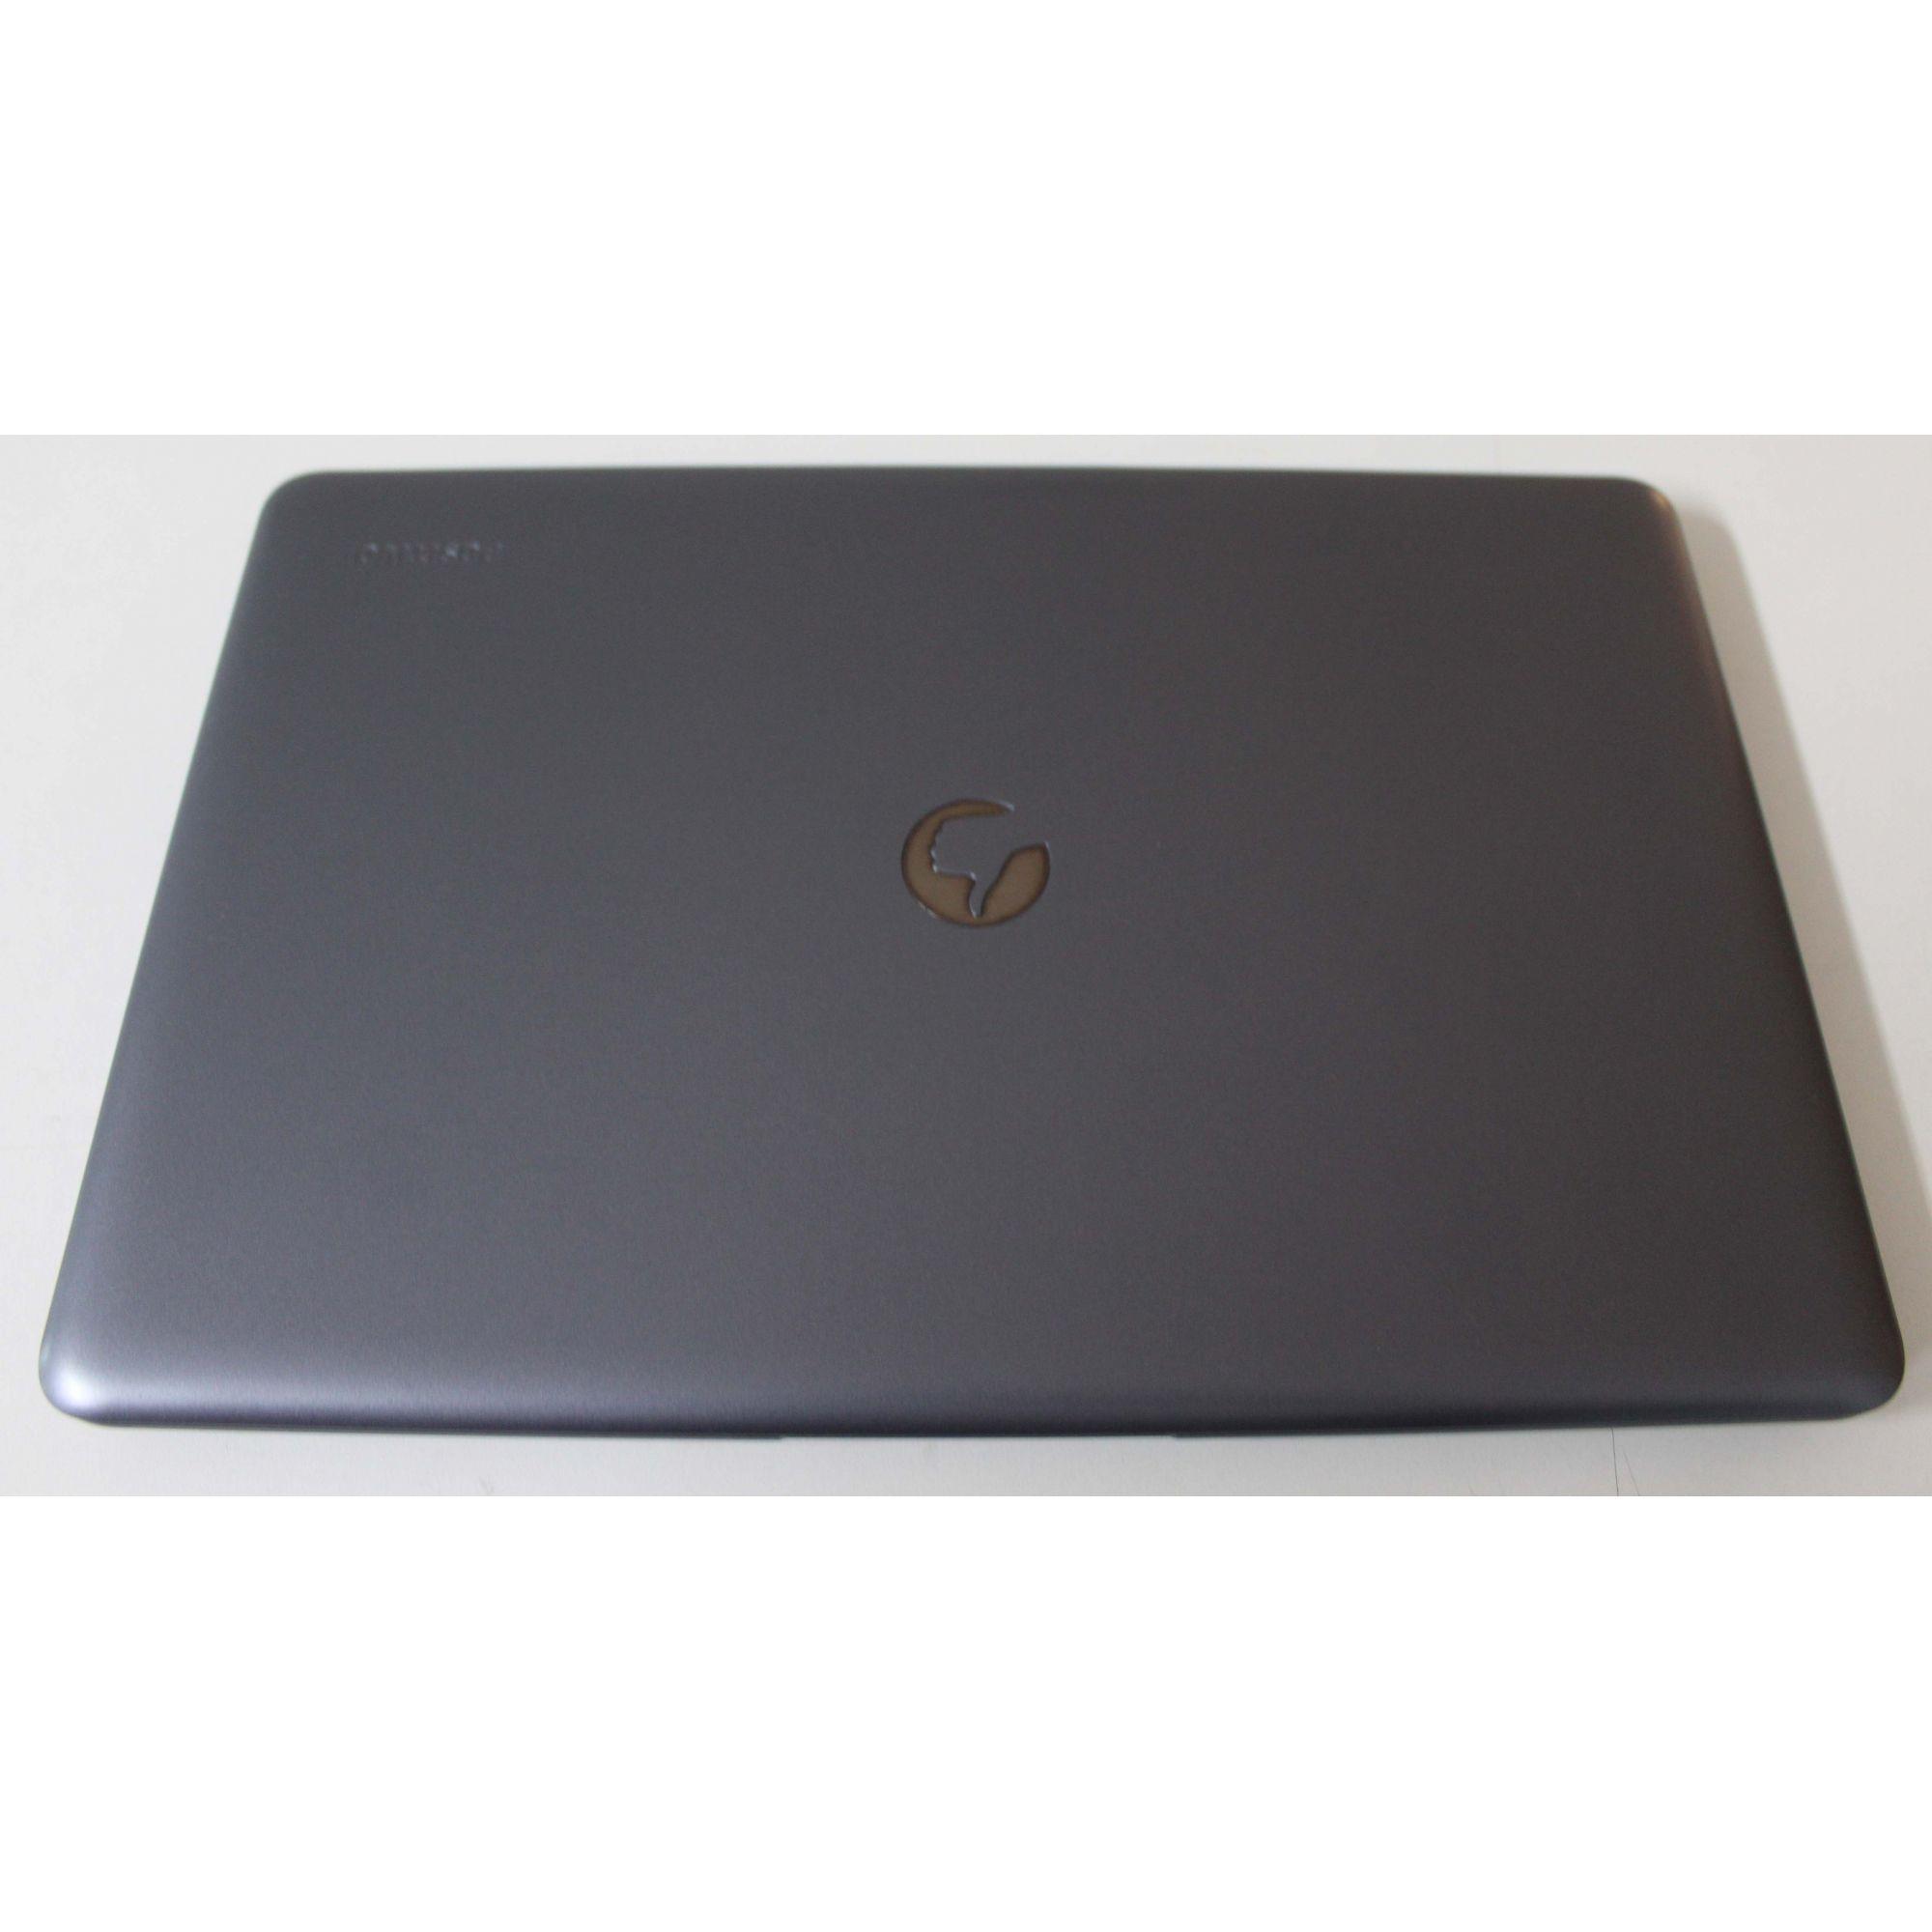 "Notebook Positivo Motion I3464A 14"" Intel Core™ i3 7020U 4GB SSD-64GB"